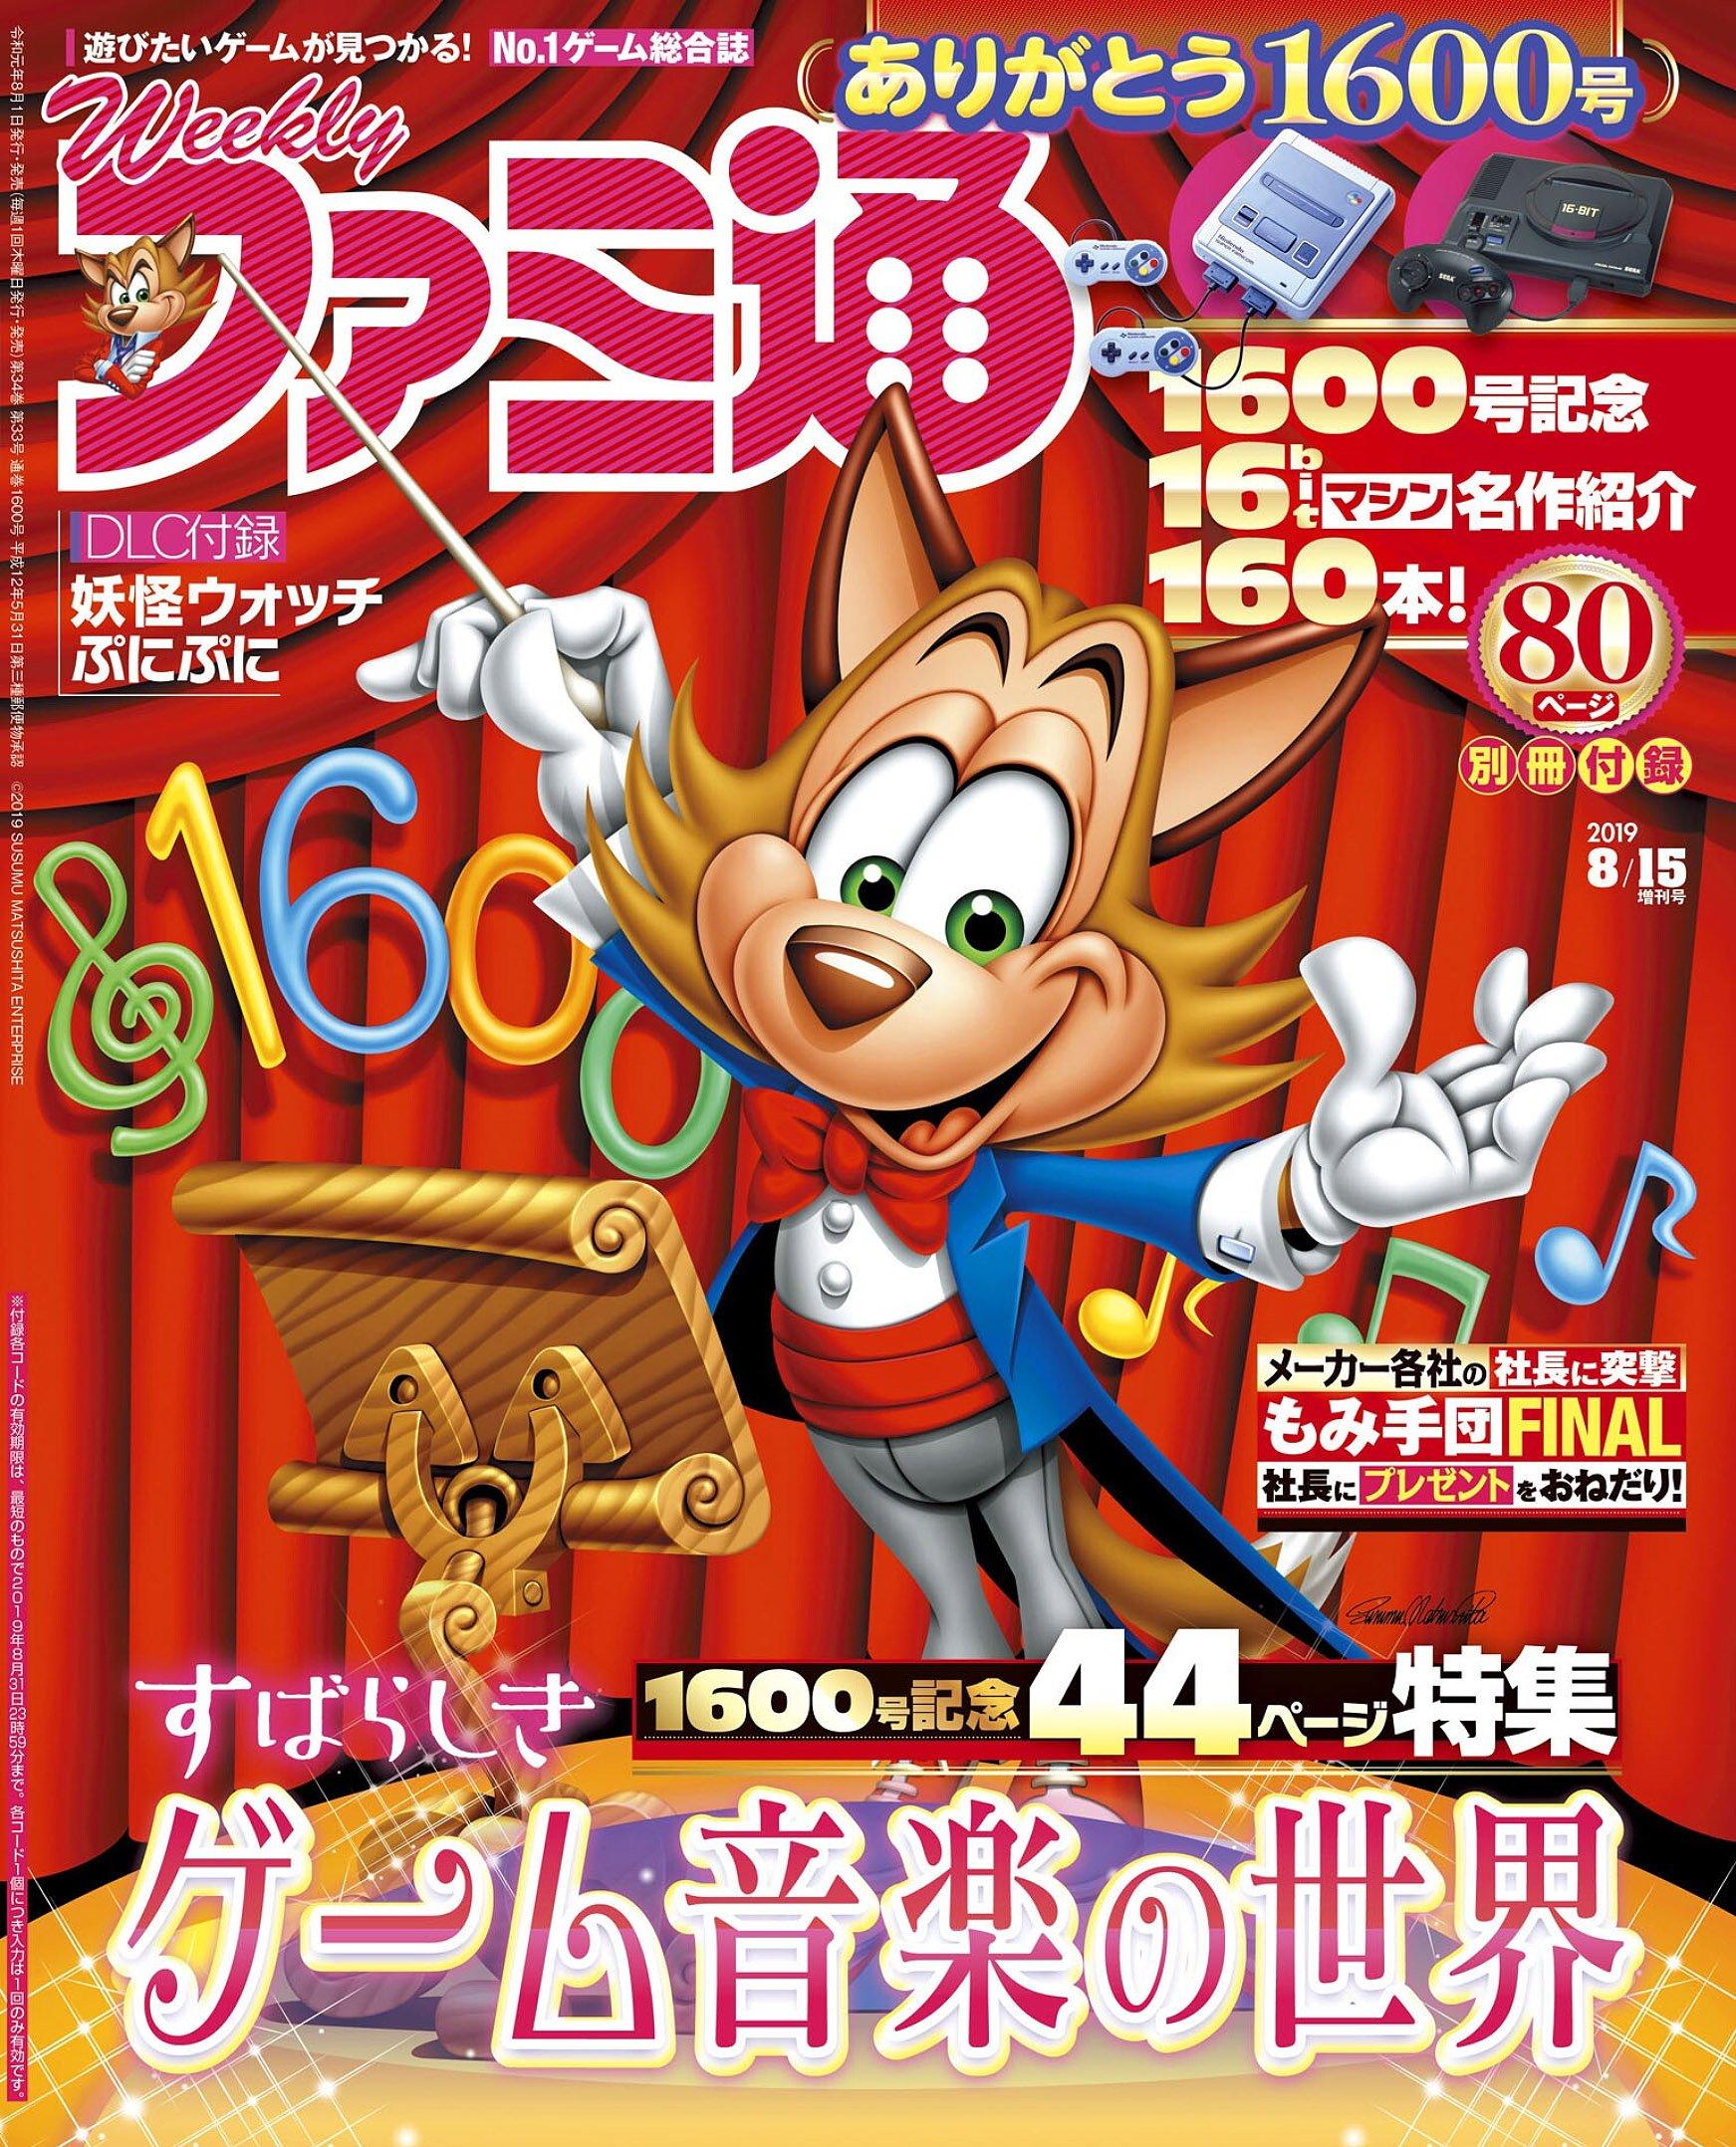 Famitsu 1600 (August 15, 2019)